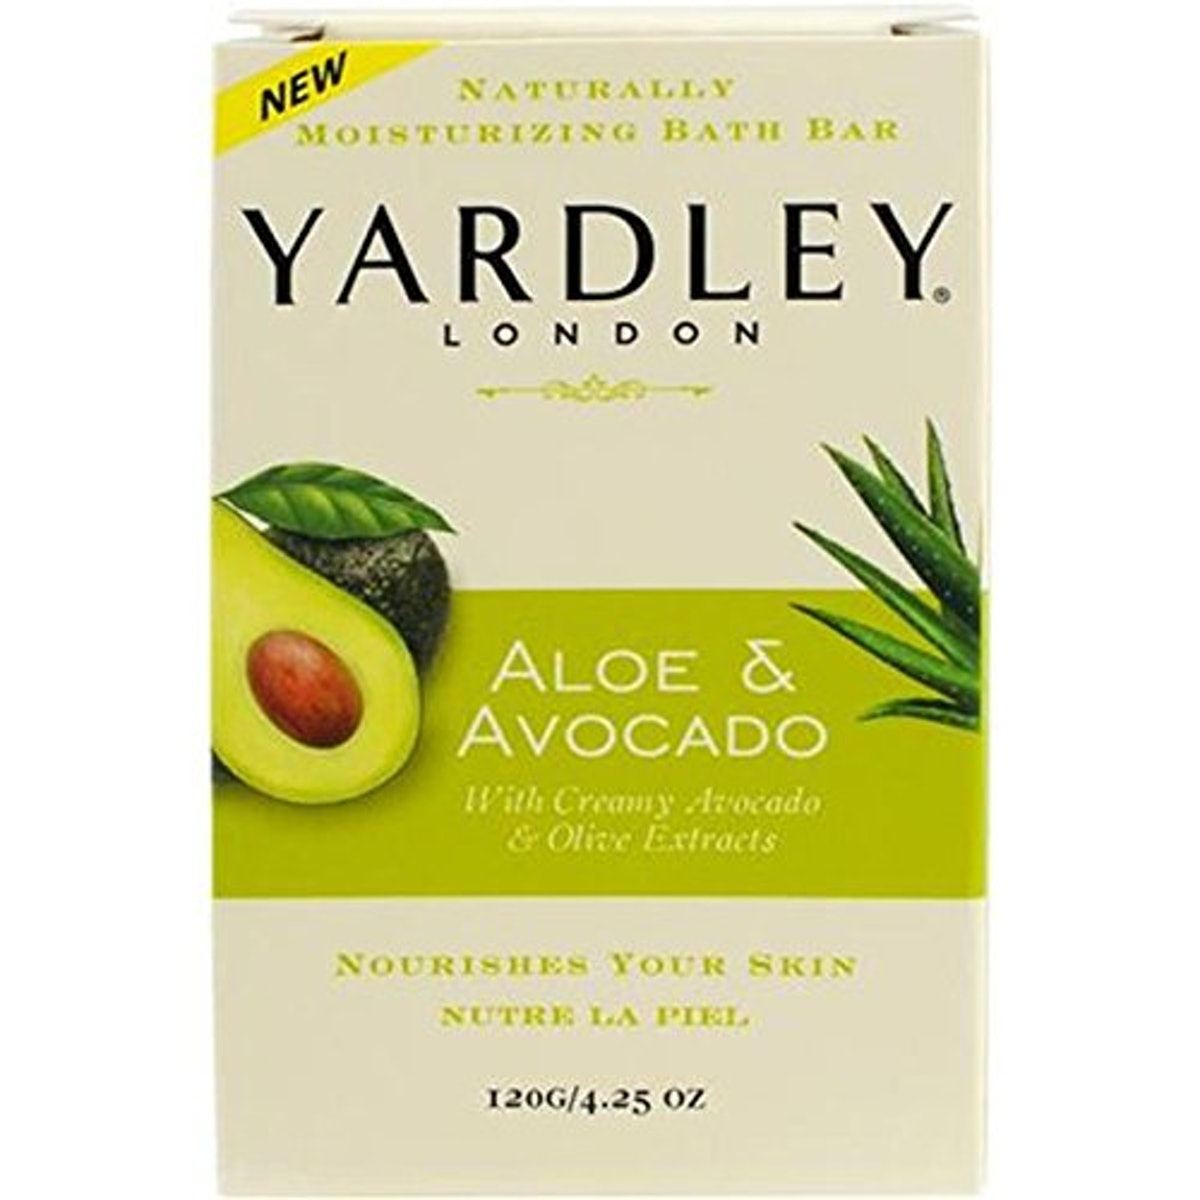 Yardley Aloe & Avocado Moisturizing Bath Bar